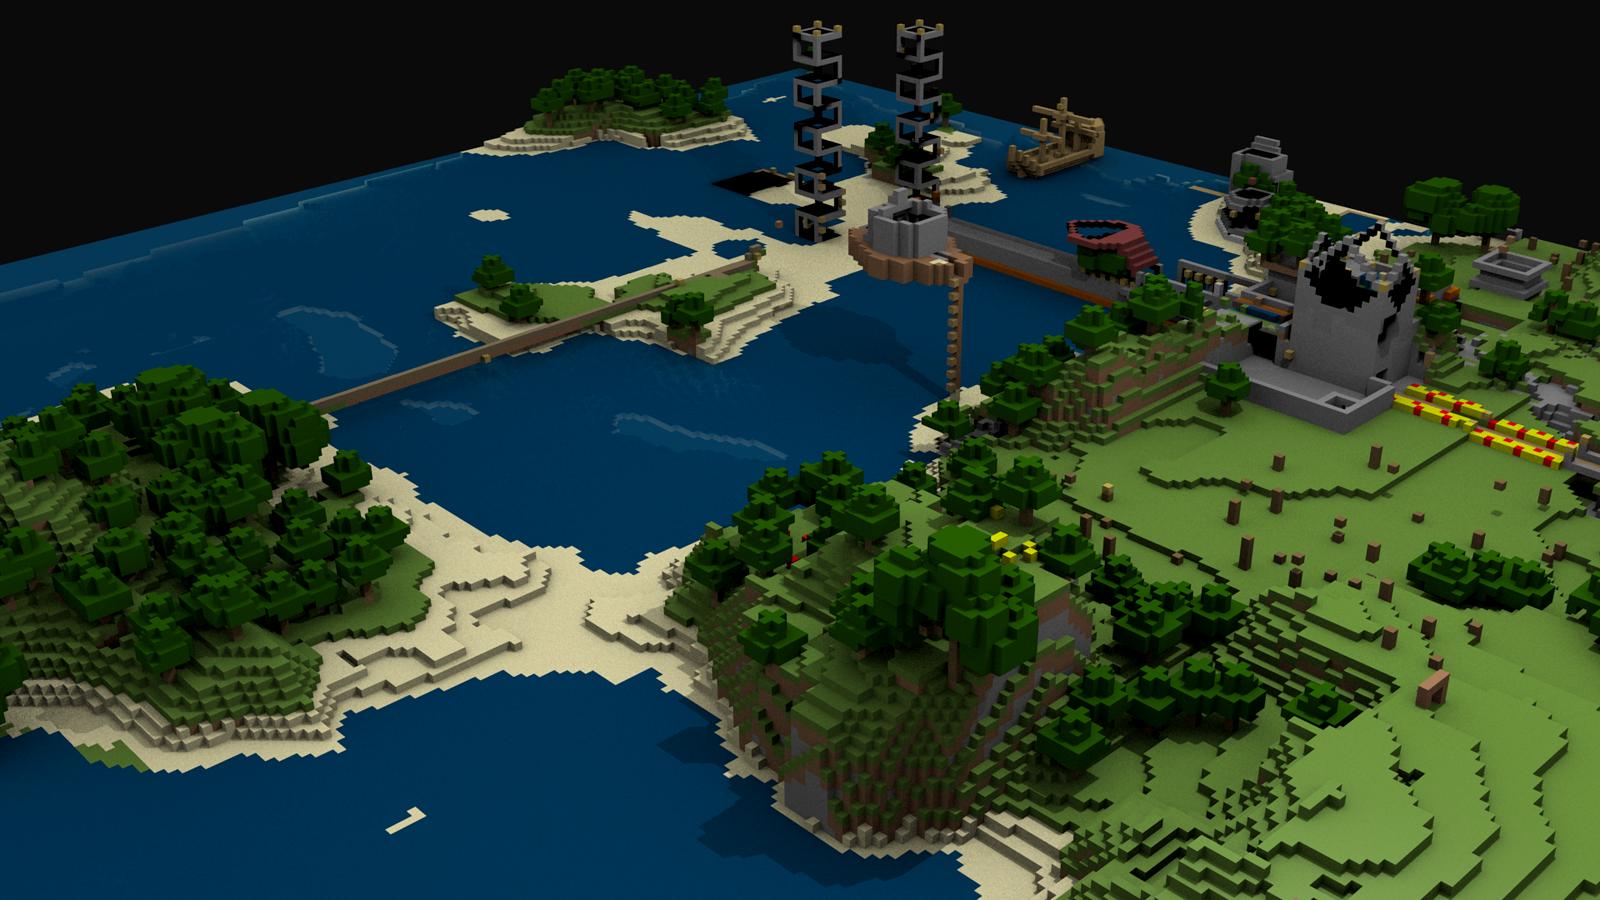 Central Wallpaper Minecraft Building Game HD Desktop Wallpapers 1600x900